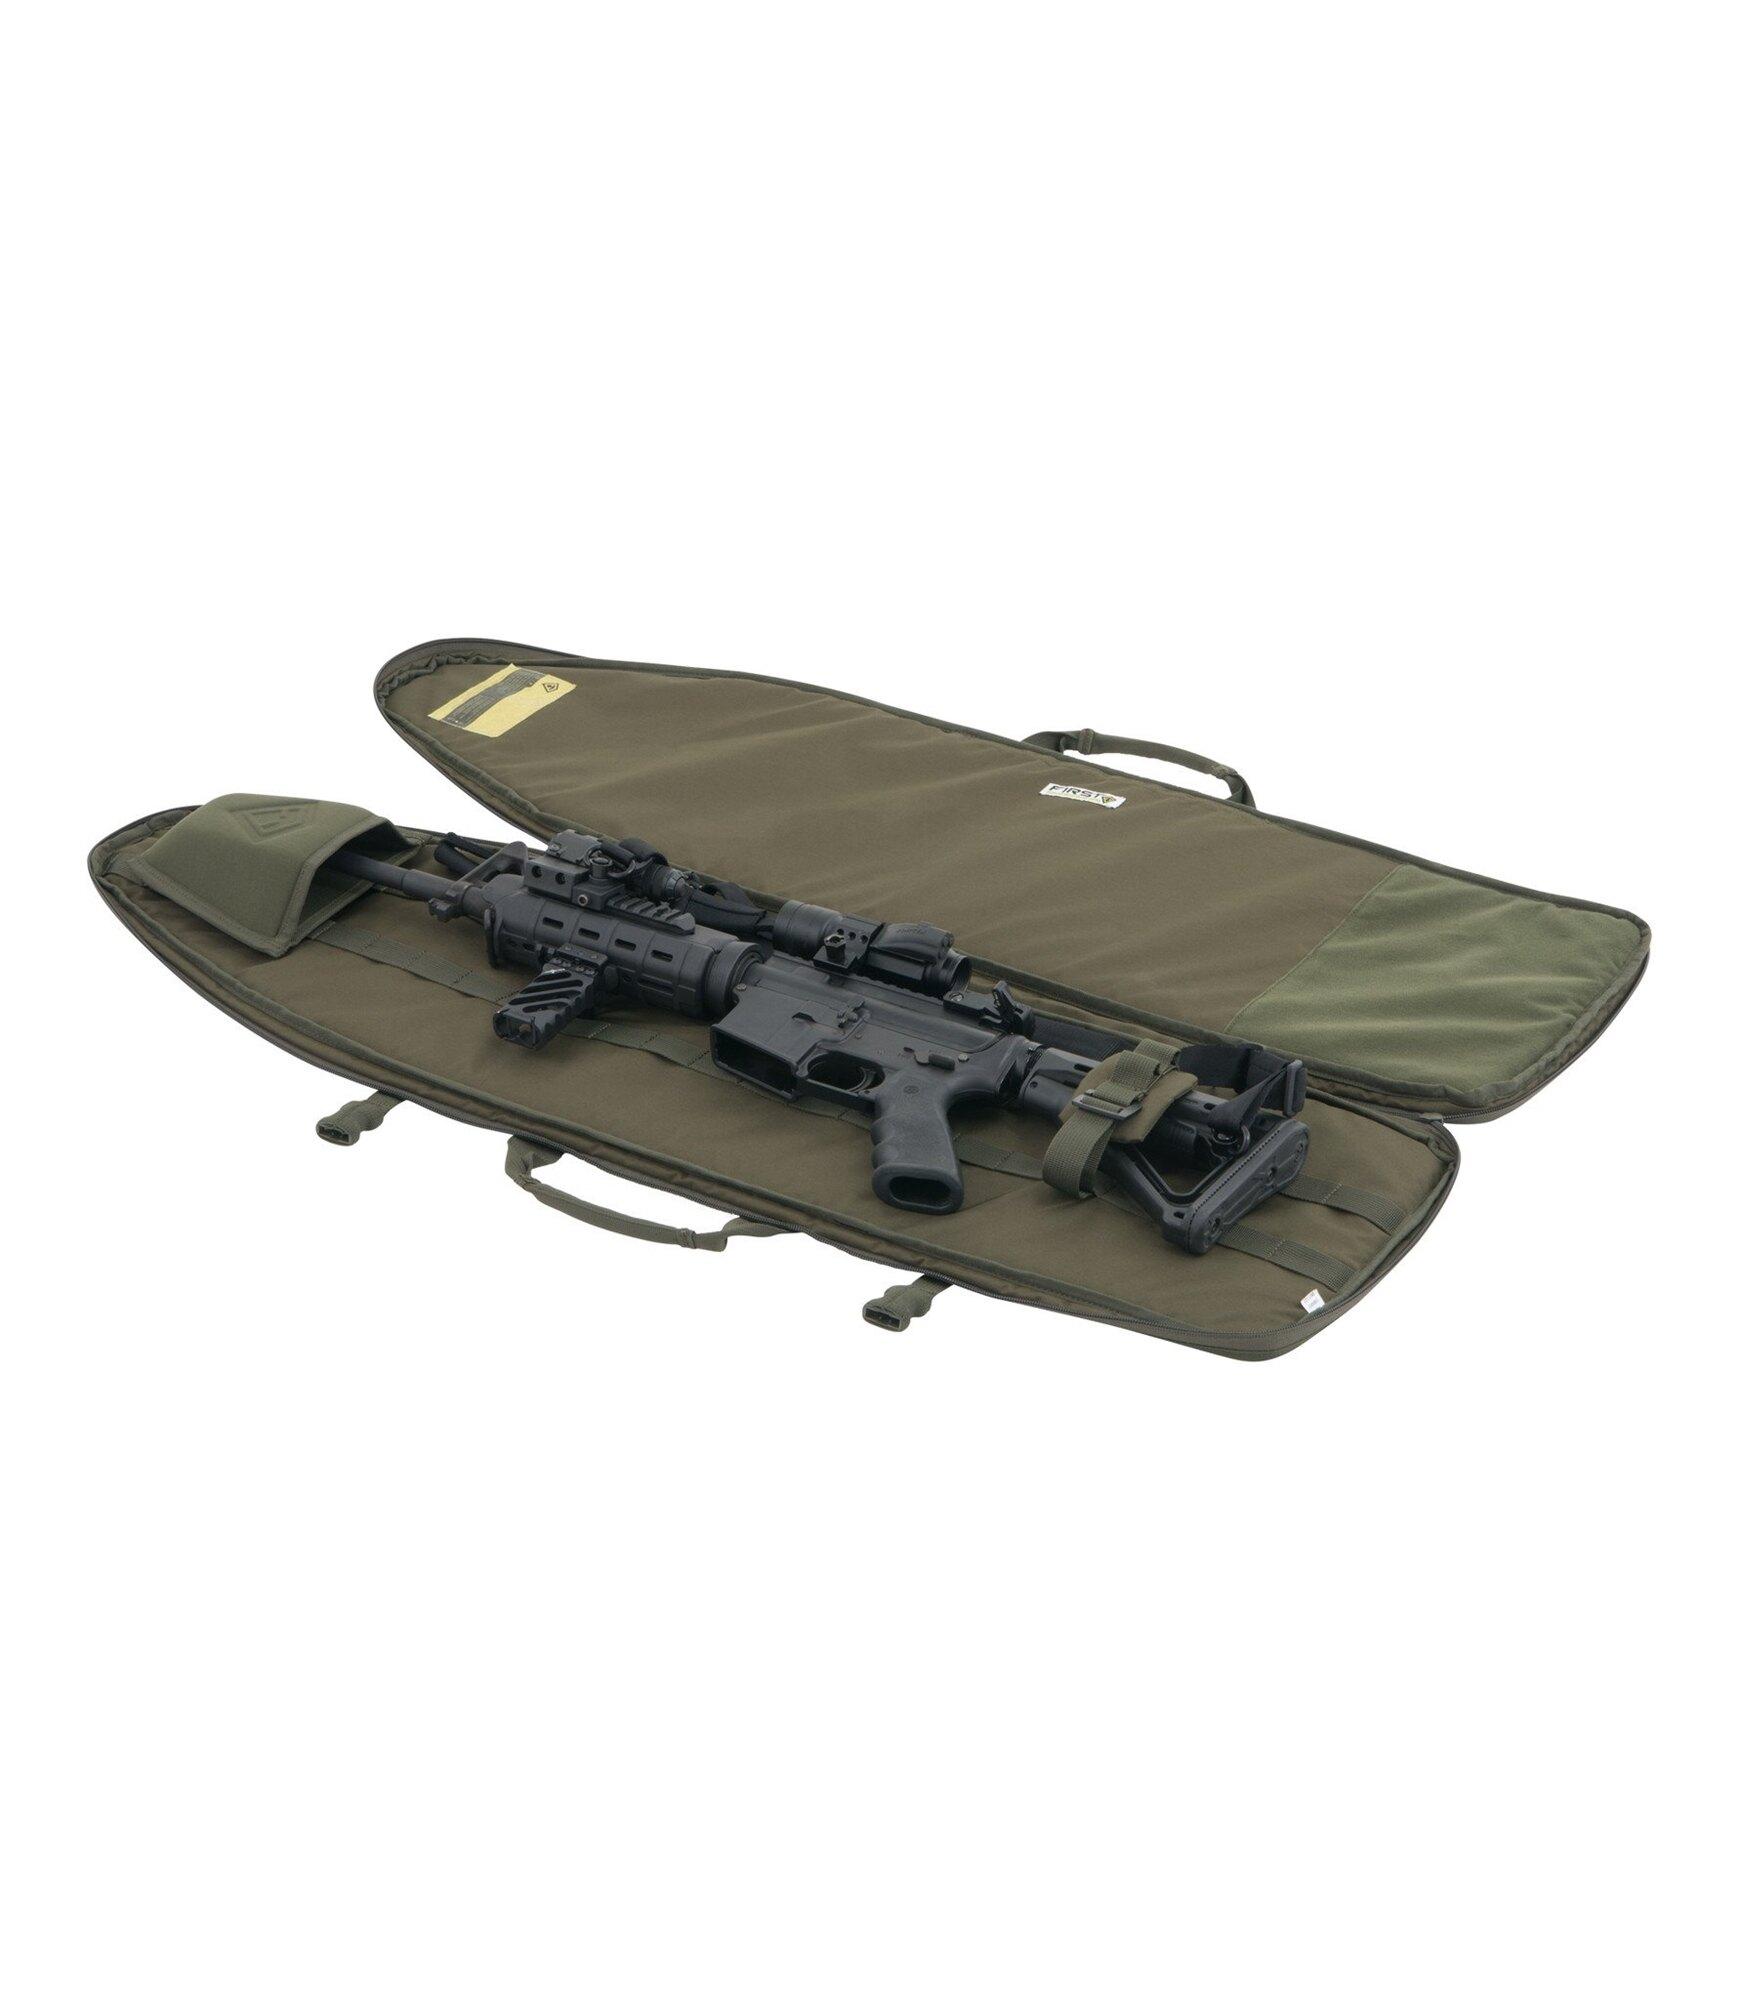 "Puzdro na zbraň First Tactical® 36"" - zelené (Farba: Zelená)"